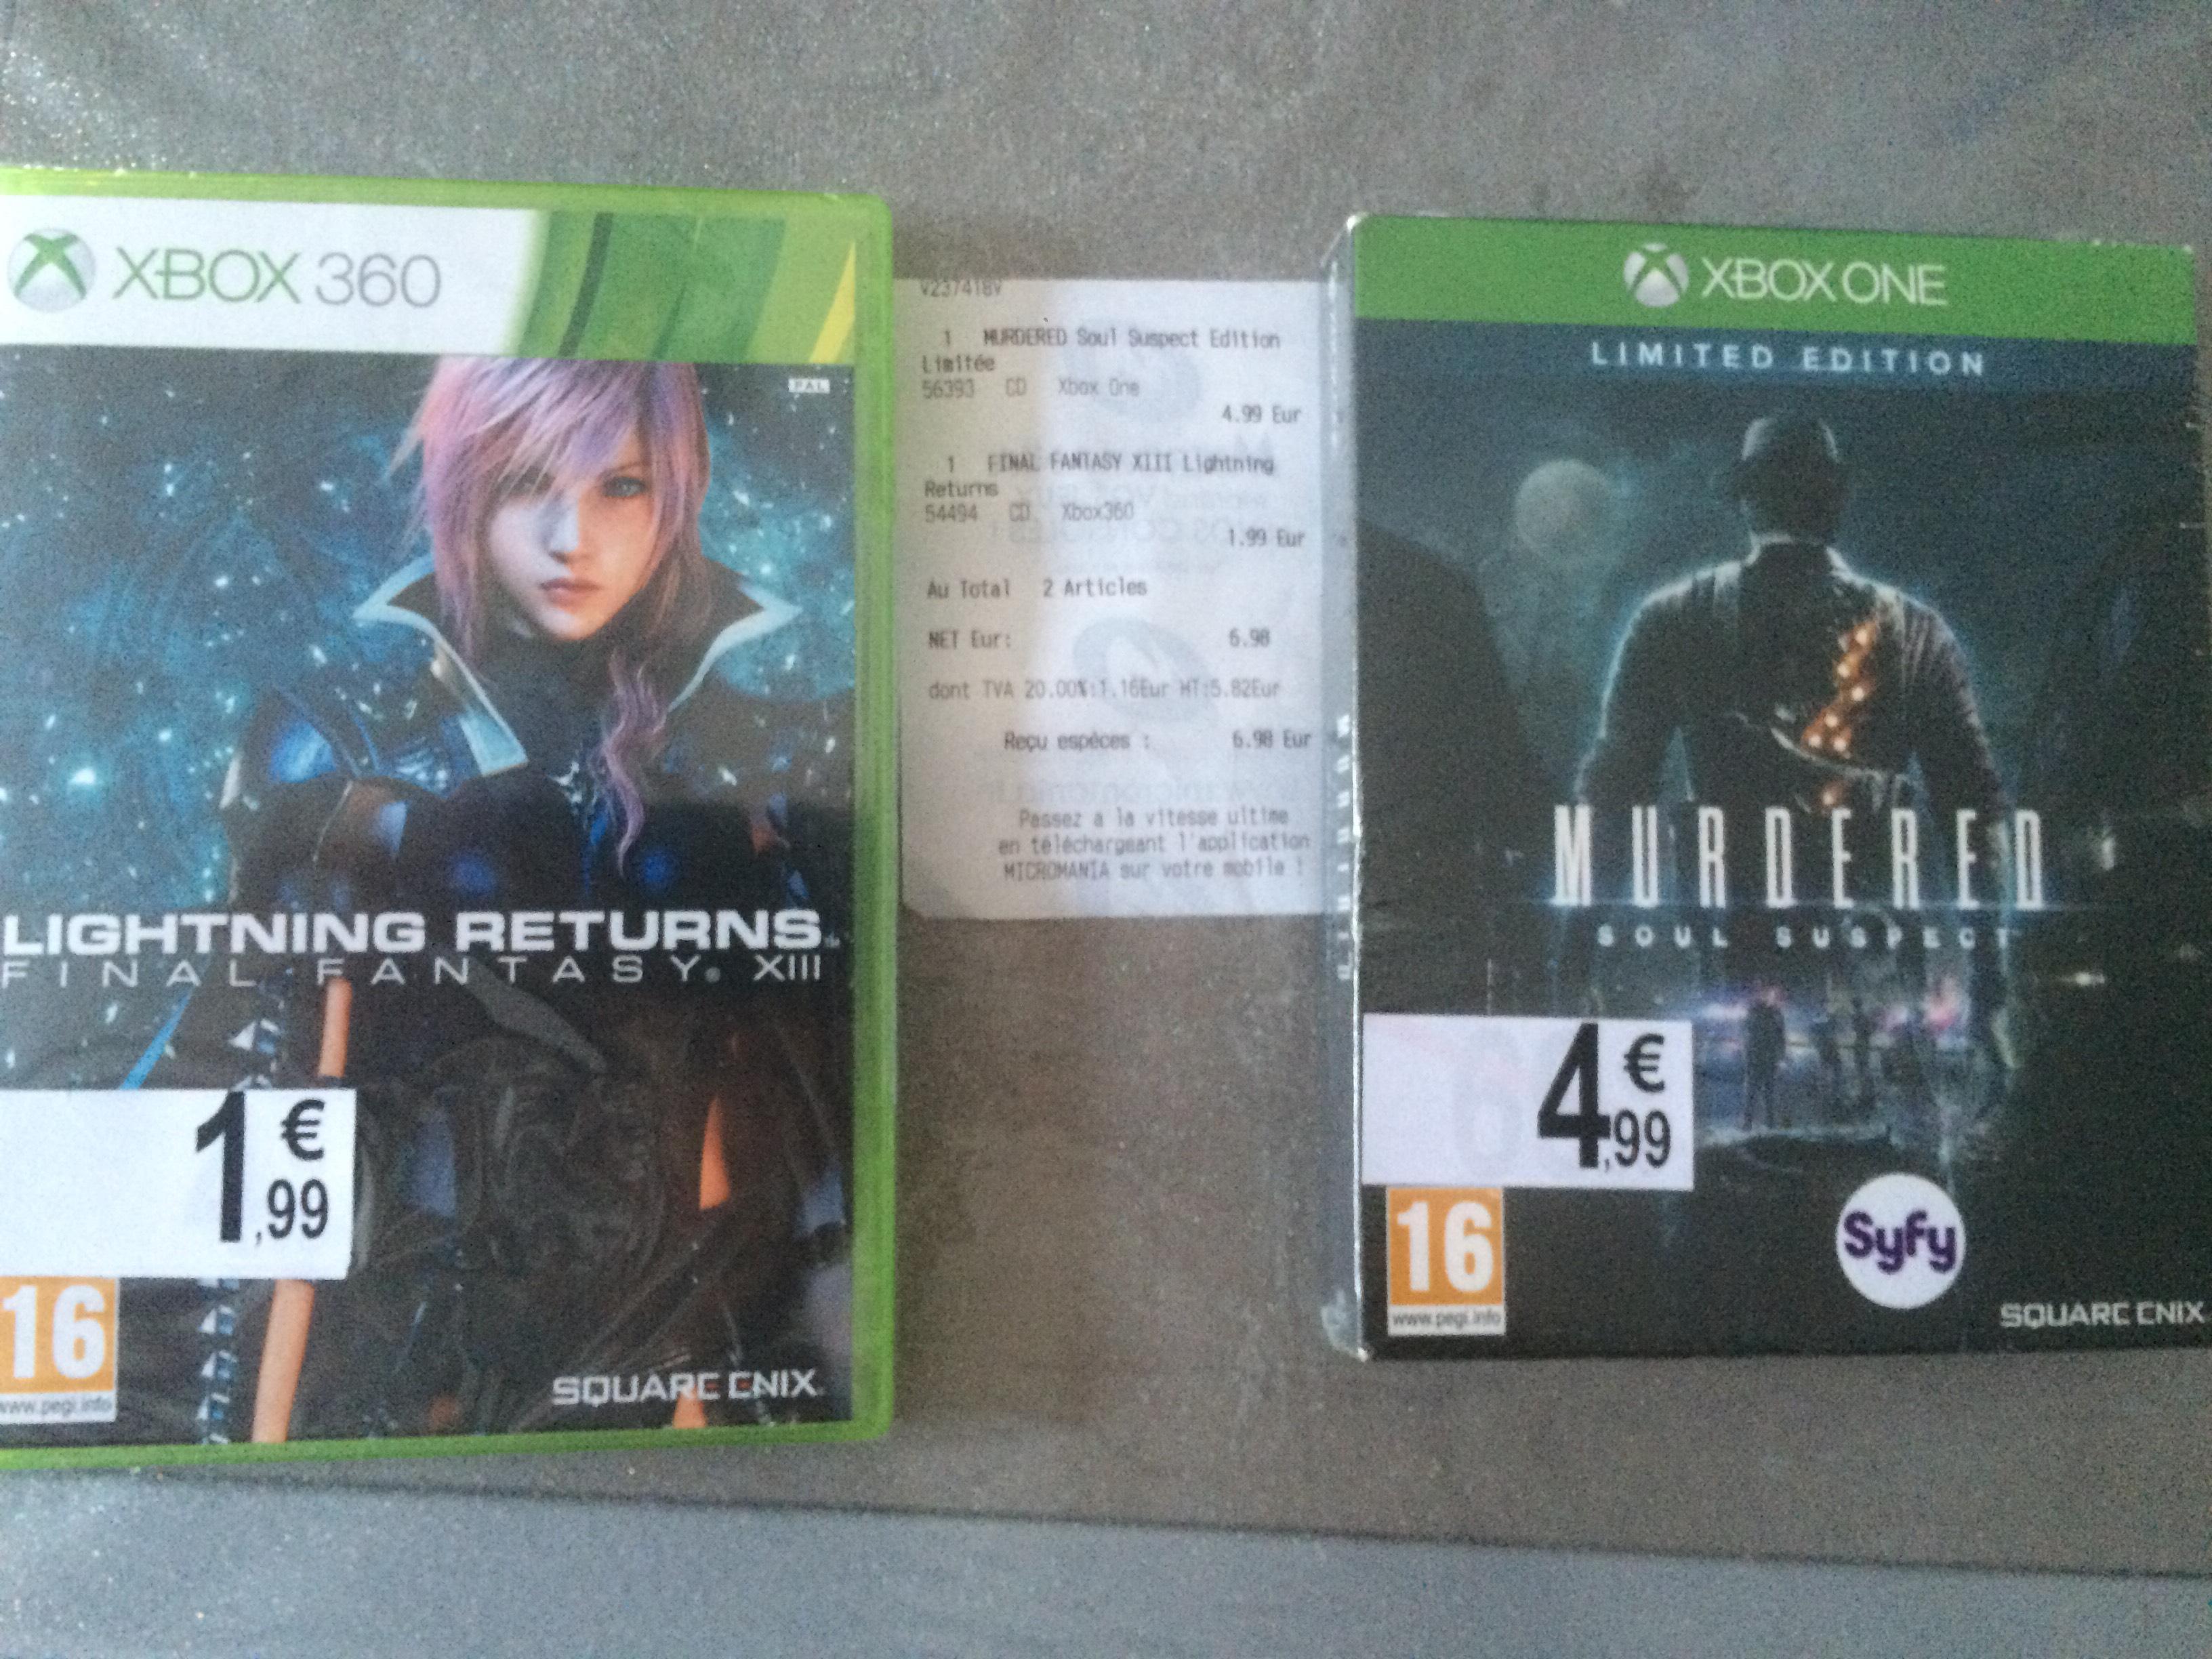 Murderer Soul Suspect Limited Edition sur Xbox One